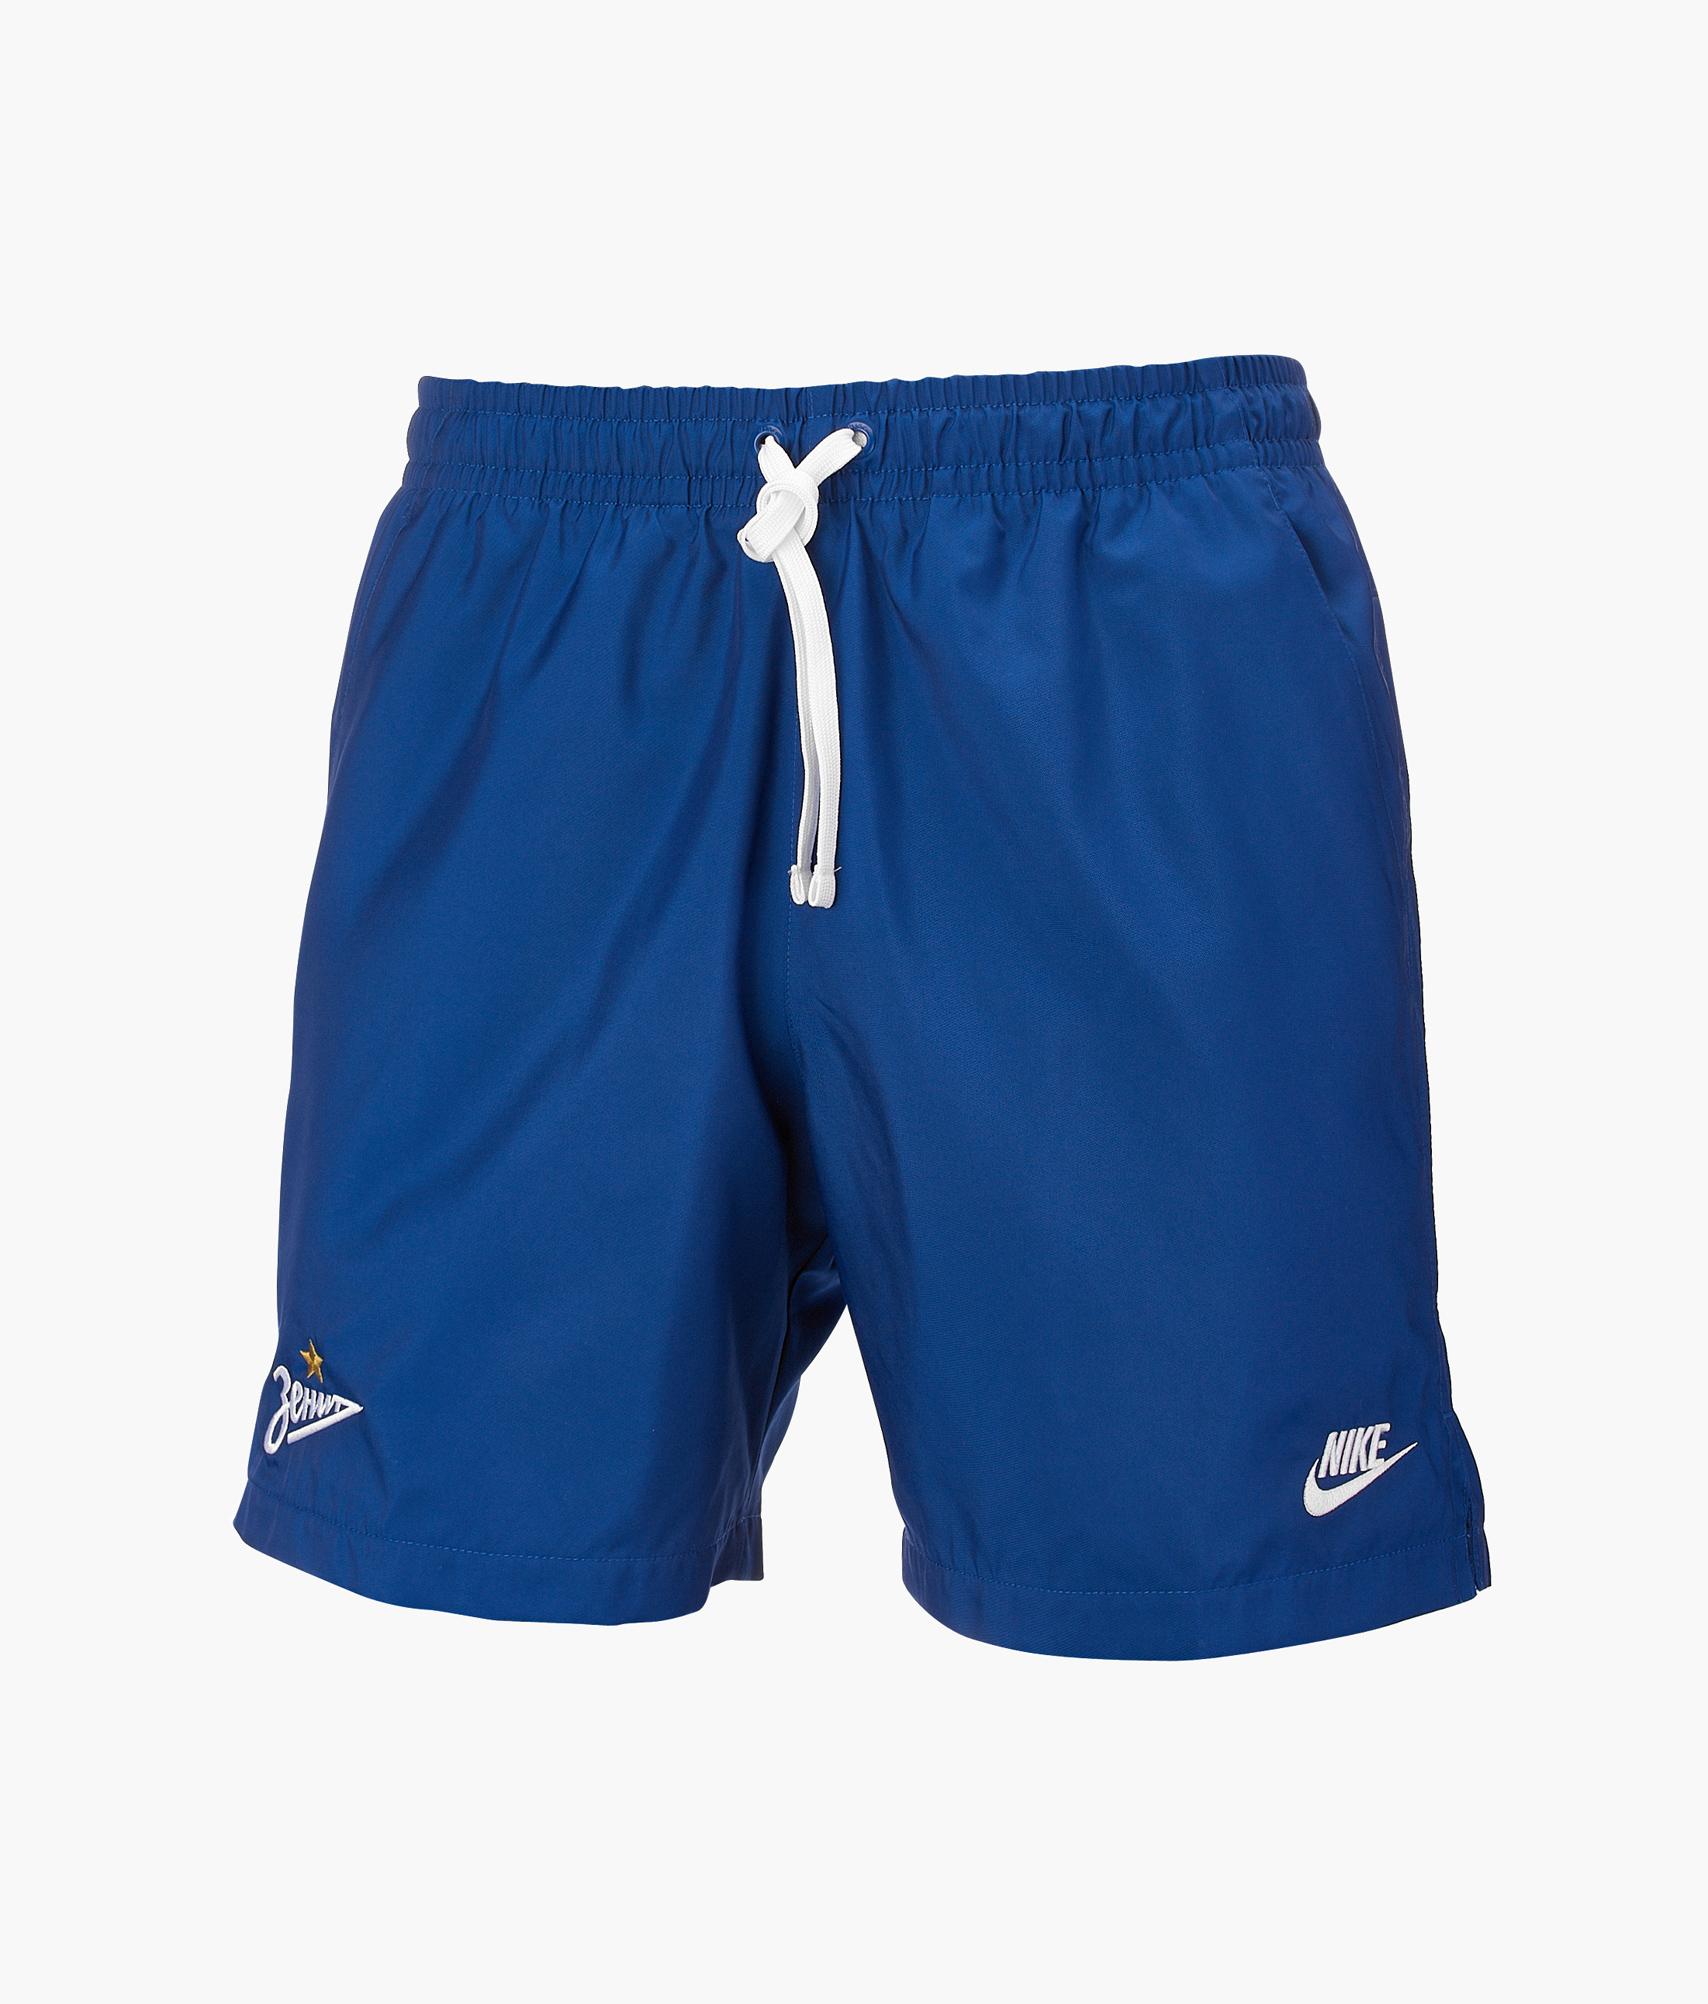 Шорты Nike  Цвет-Синий